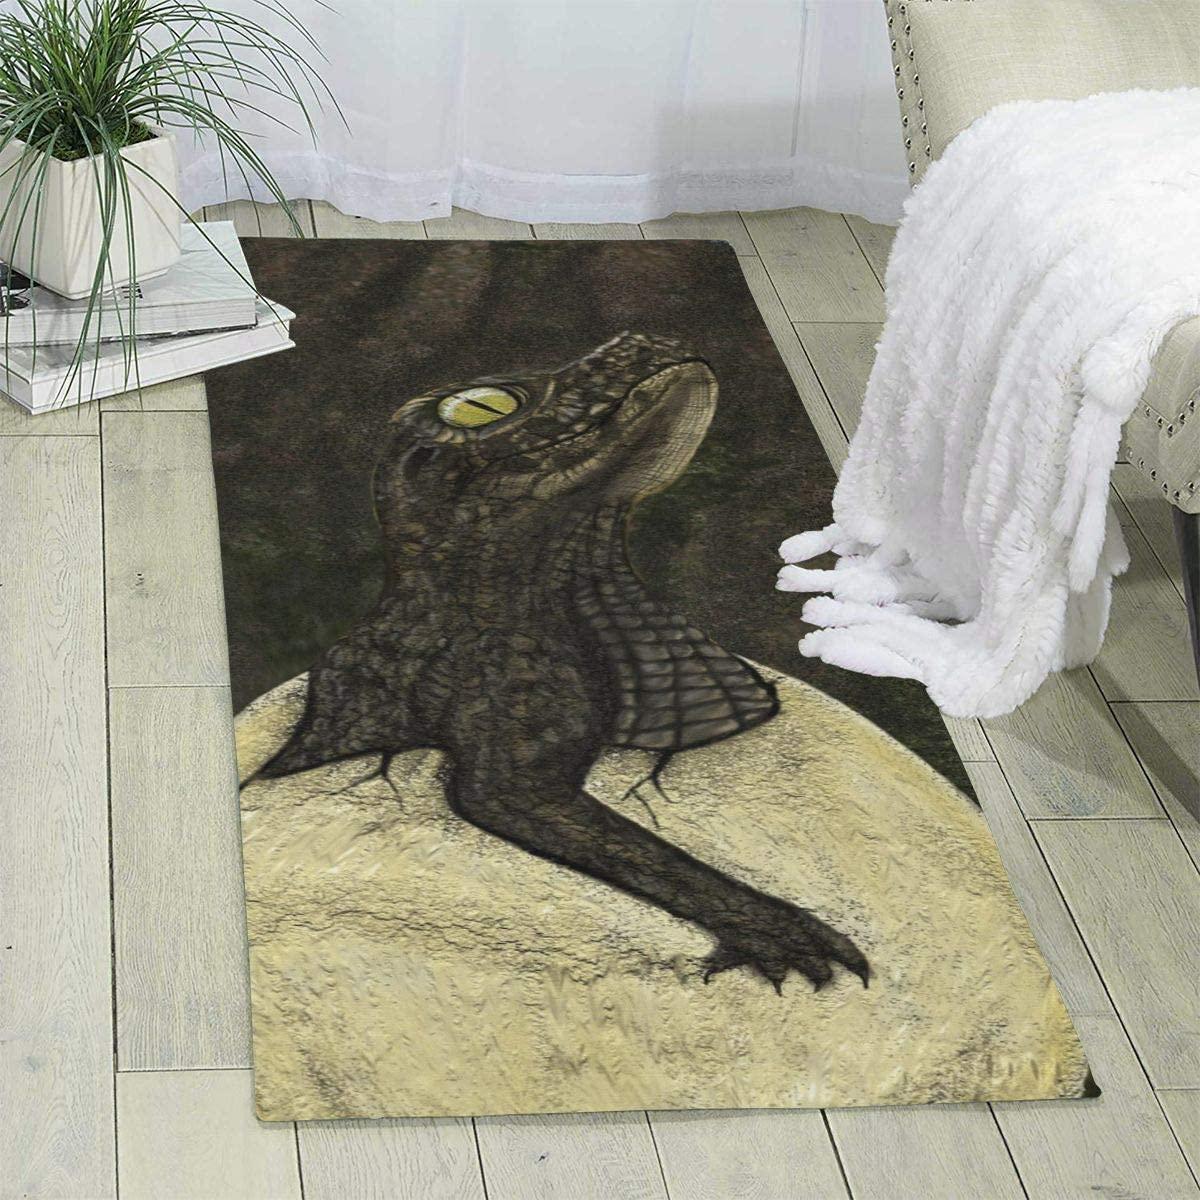 Pooizsdzzz Carpet 70 X 24 X 6mm Crocodile Egg Modern Area Rug for Bedroom Living Room Floor Home Decor